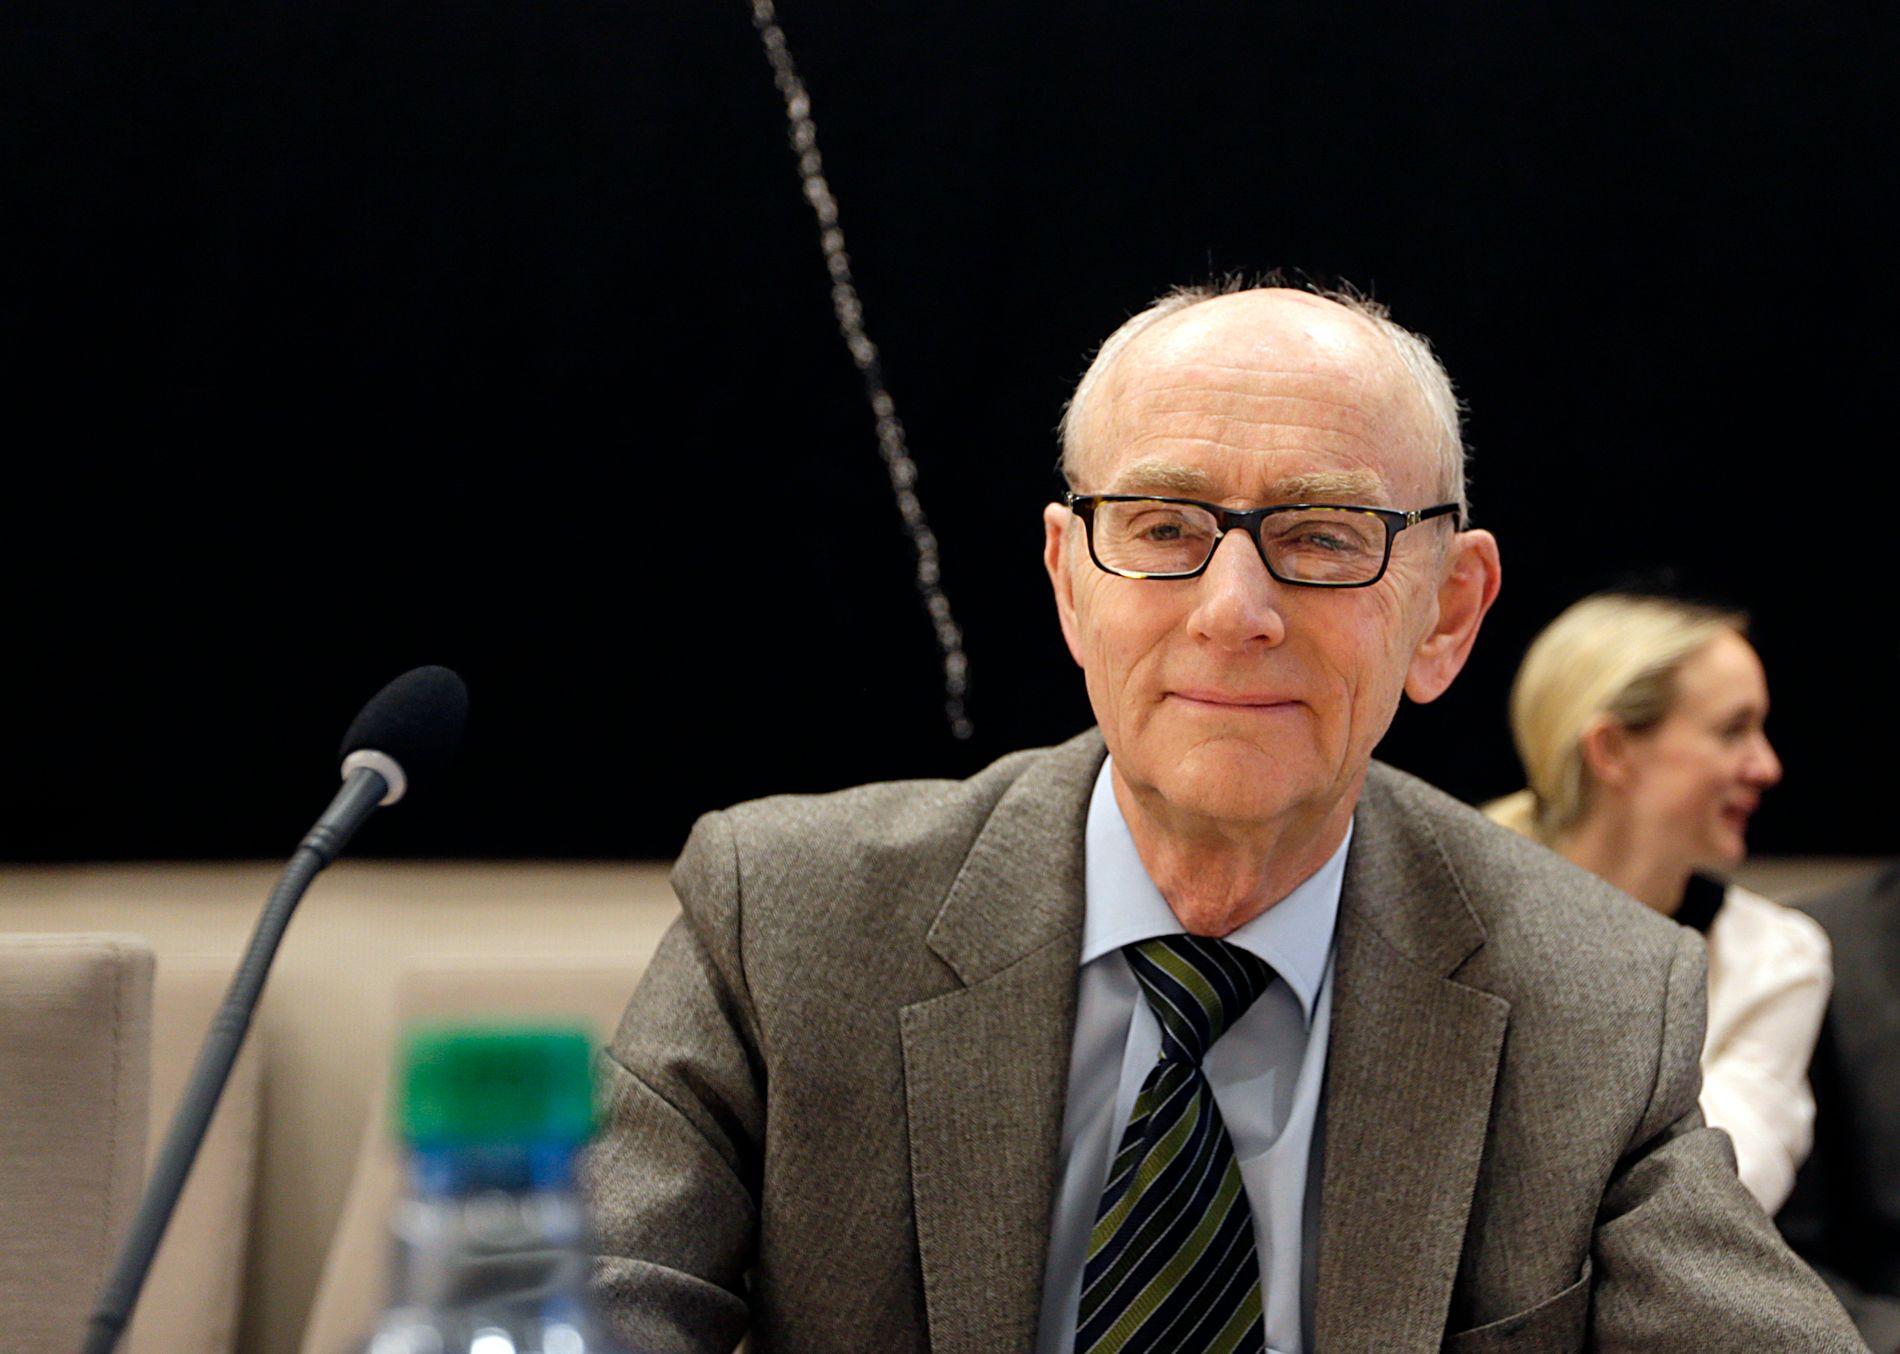 FORVALTNINGSEKSPERT: Jusprofessor Jan Fridthjof Bernt ved Universitetet i Bergen mener UD bør offentliggjøre sine funn.